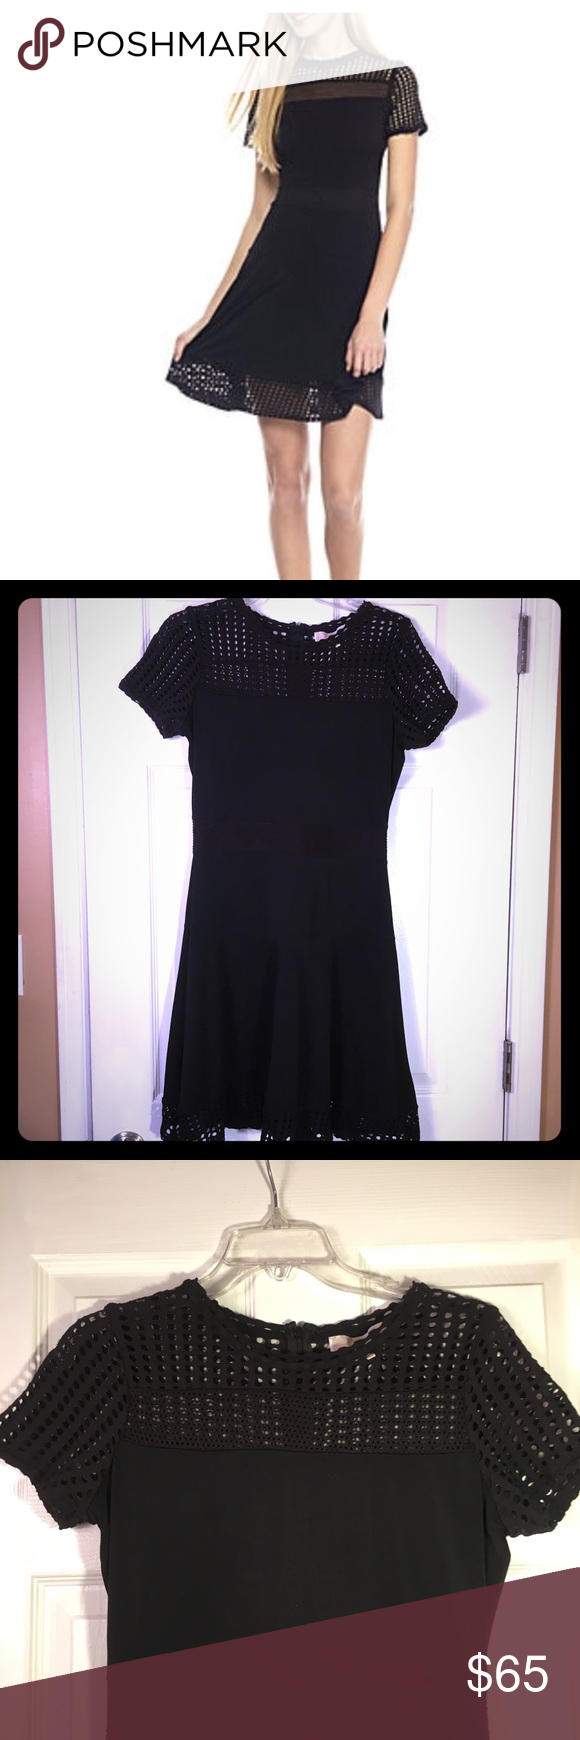 Michael Michael Kors Black Mesh Combo Dress Size M Combo Dress Clothes Design Michael Kors Dresses [ 1740 x 580 Pixel ]